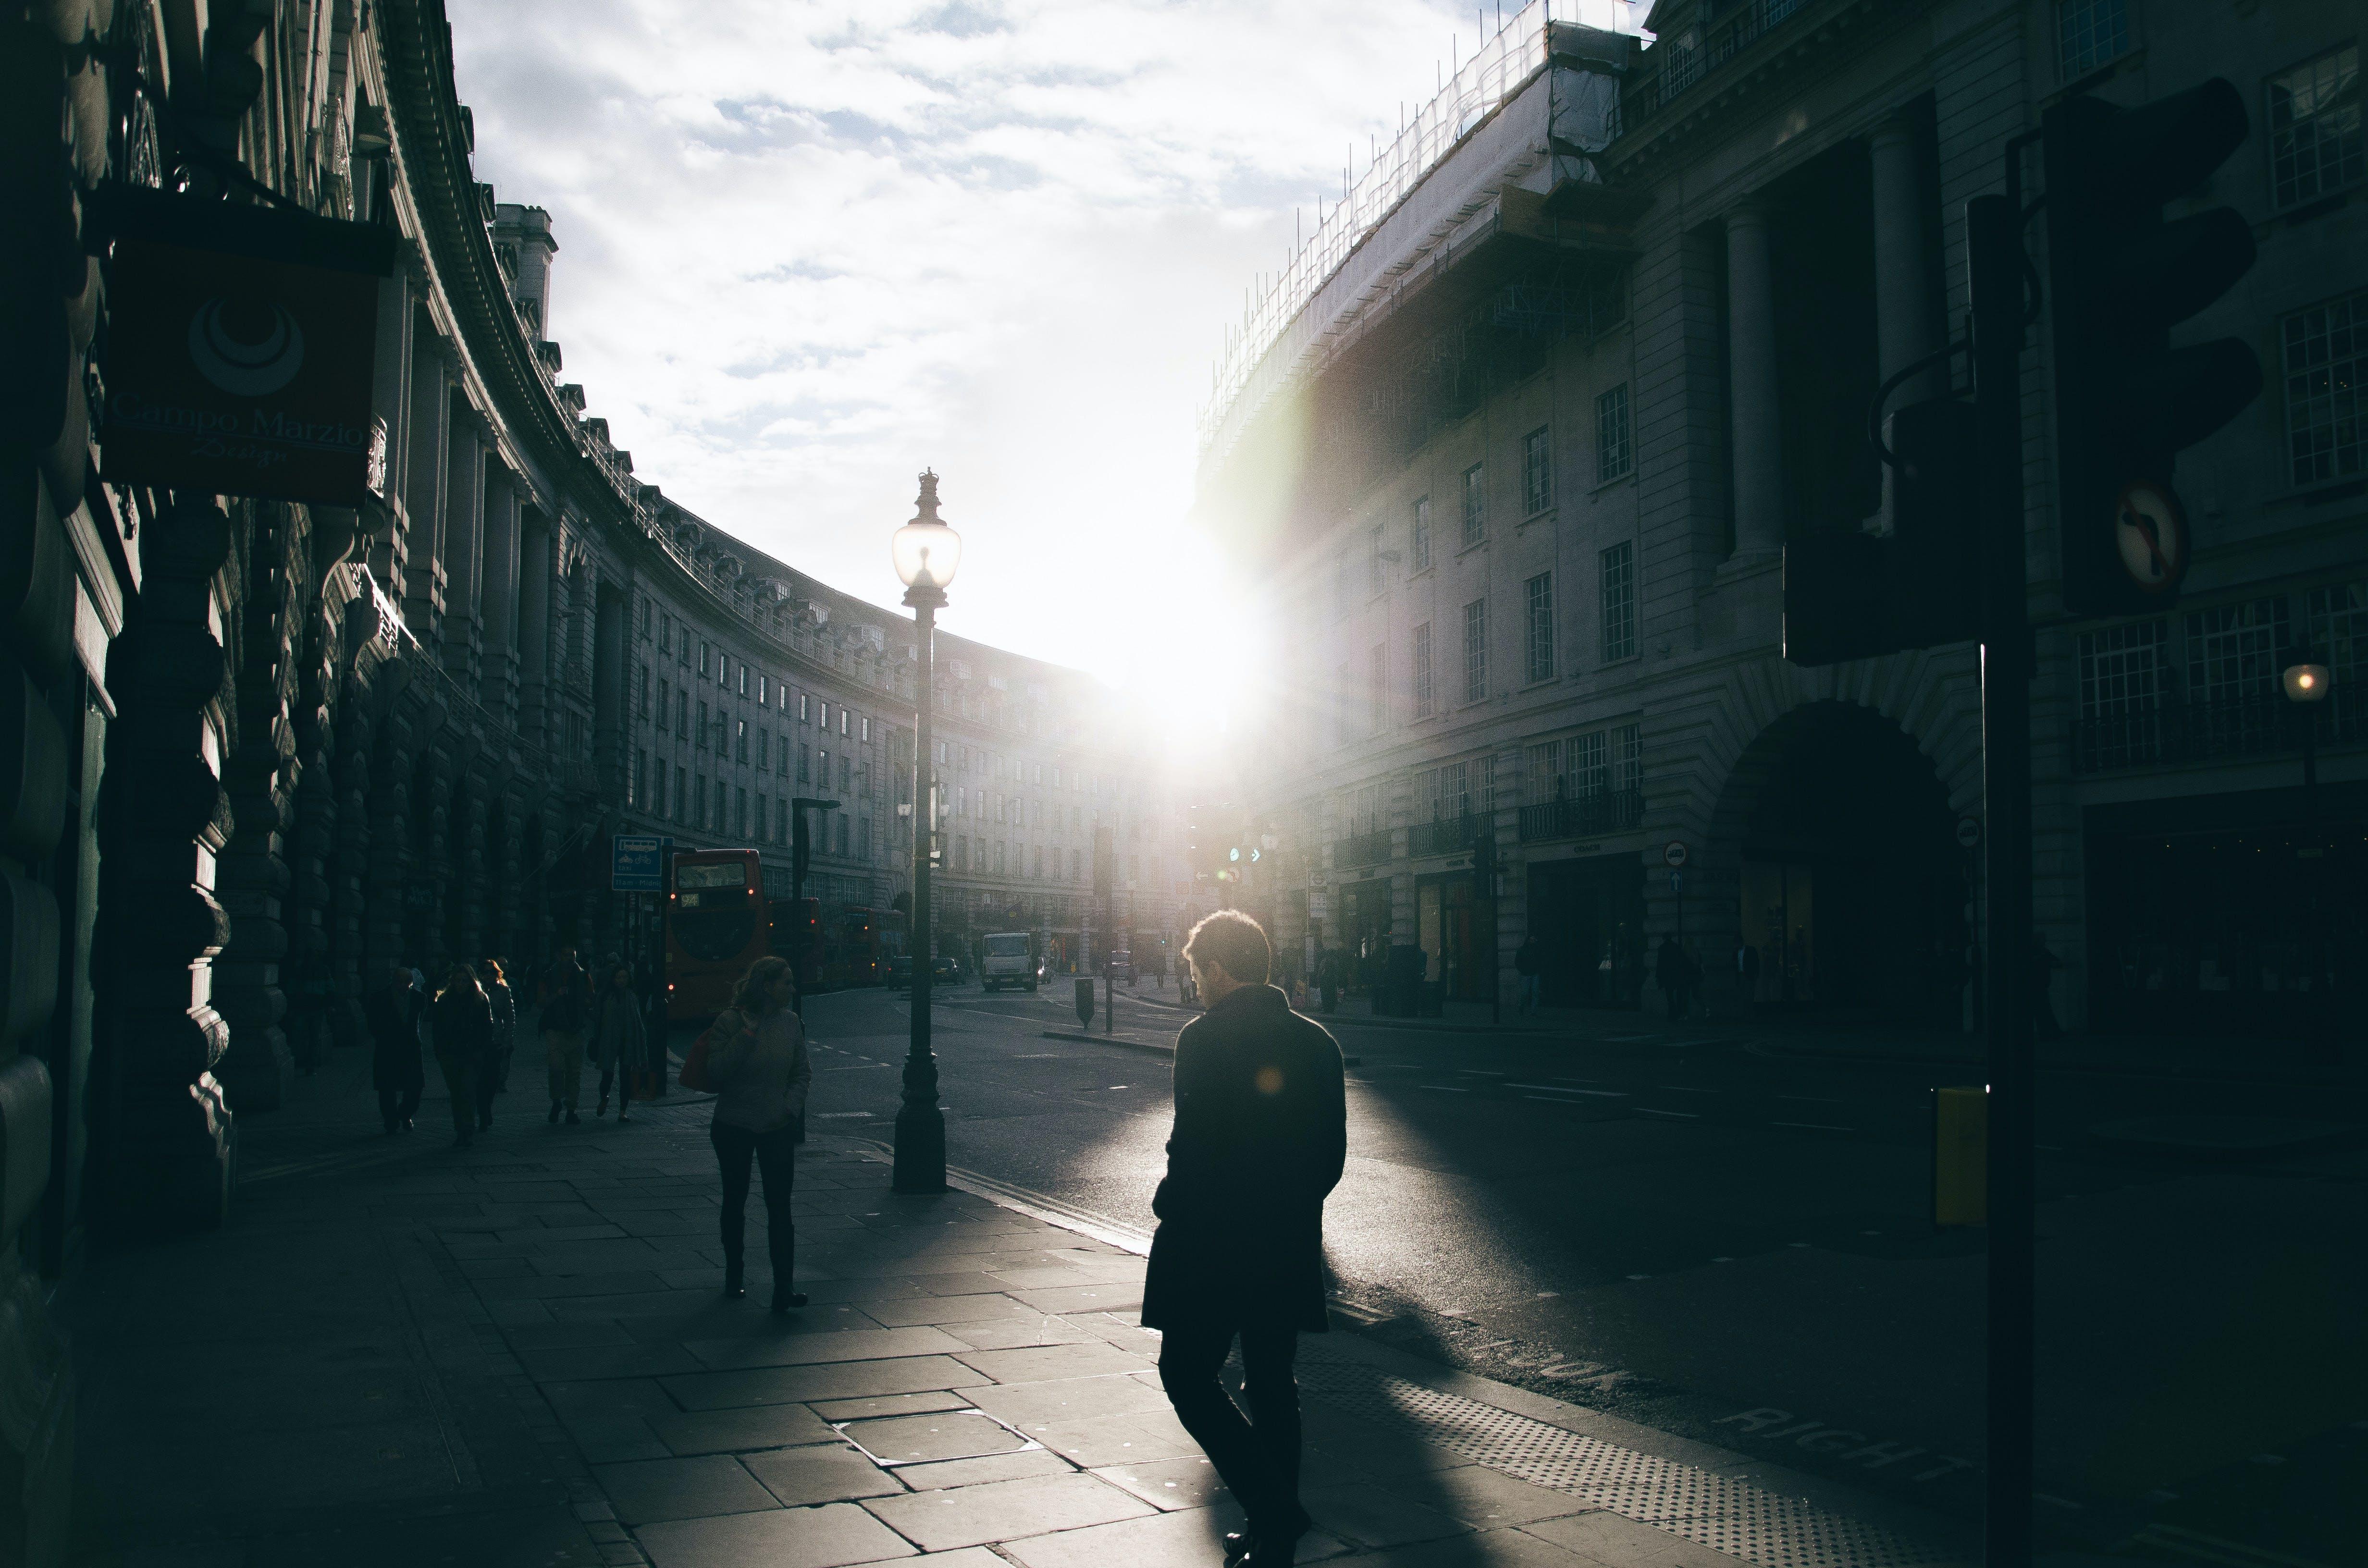 city, light, people